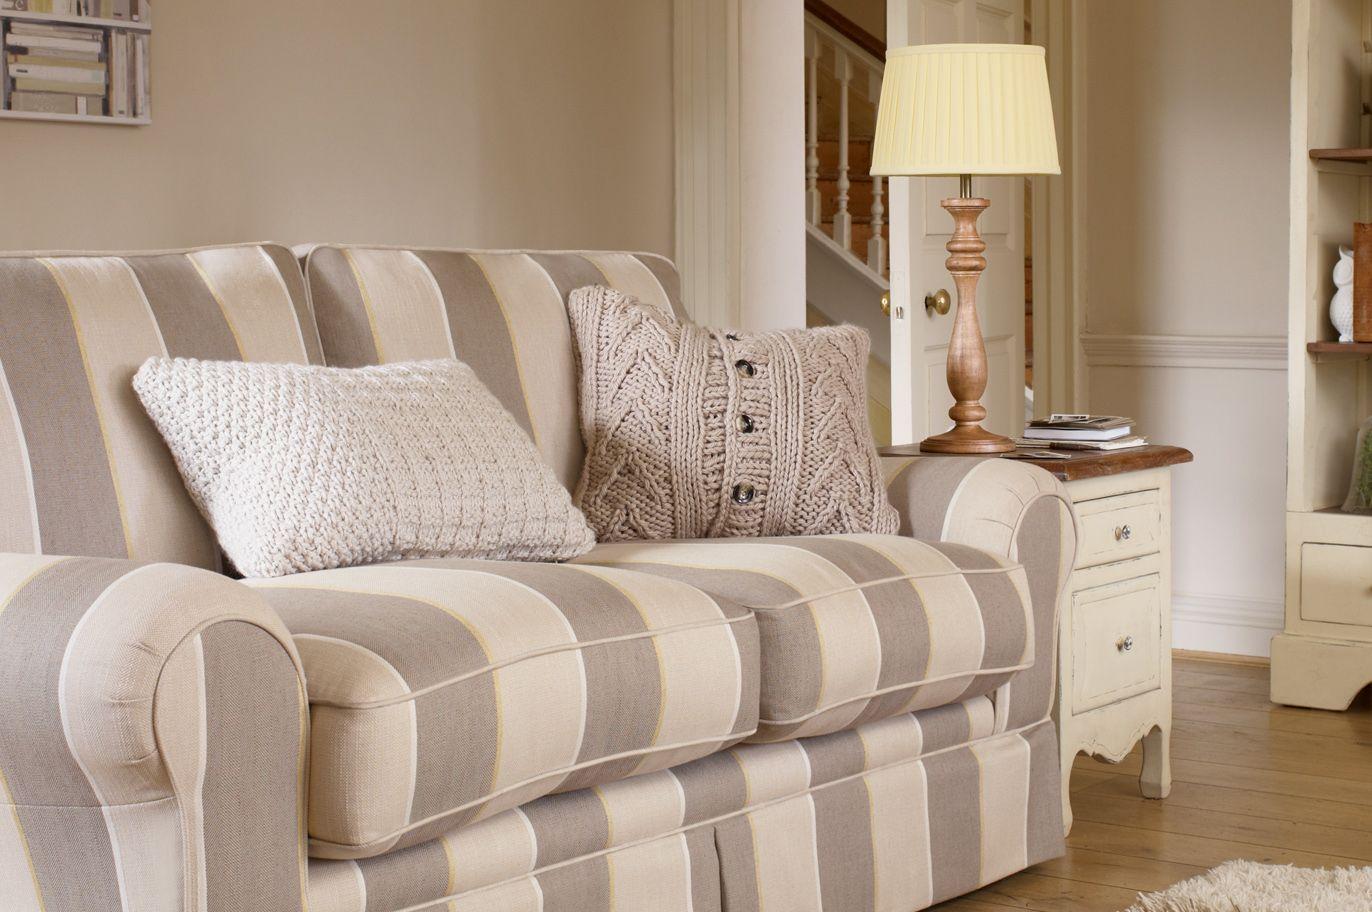 laura ashley home sweet home pinterest. Black Bedroom Furniture Sets. Home Design Ideas